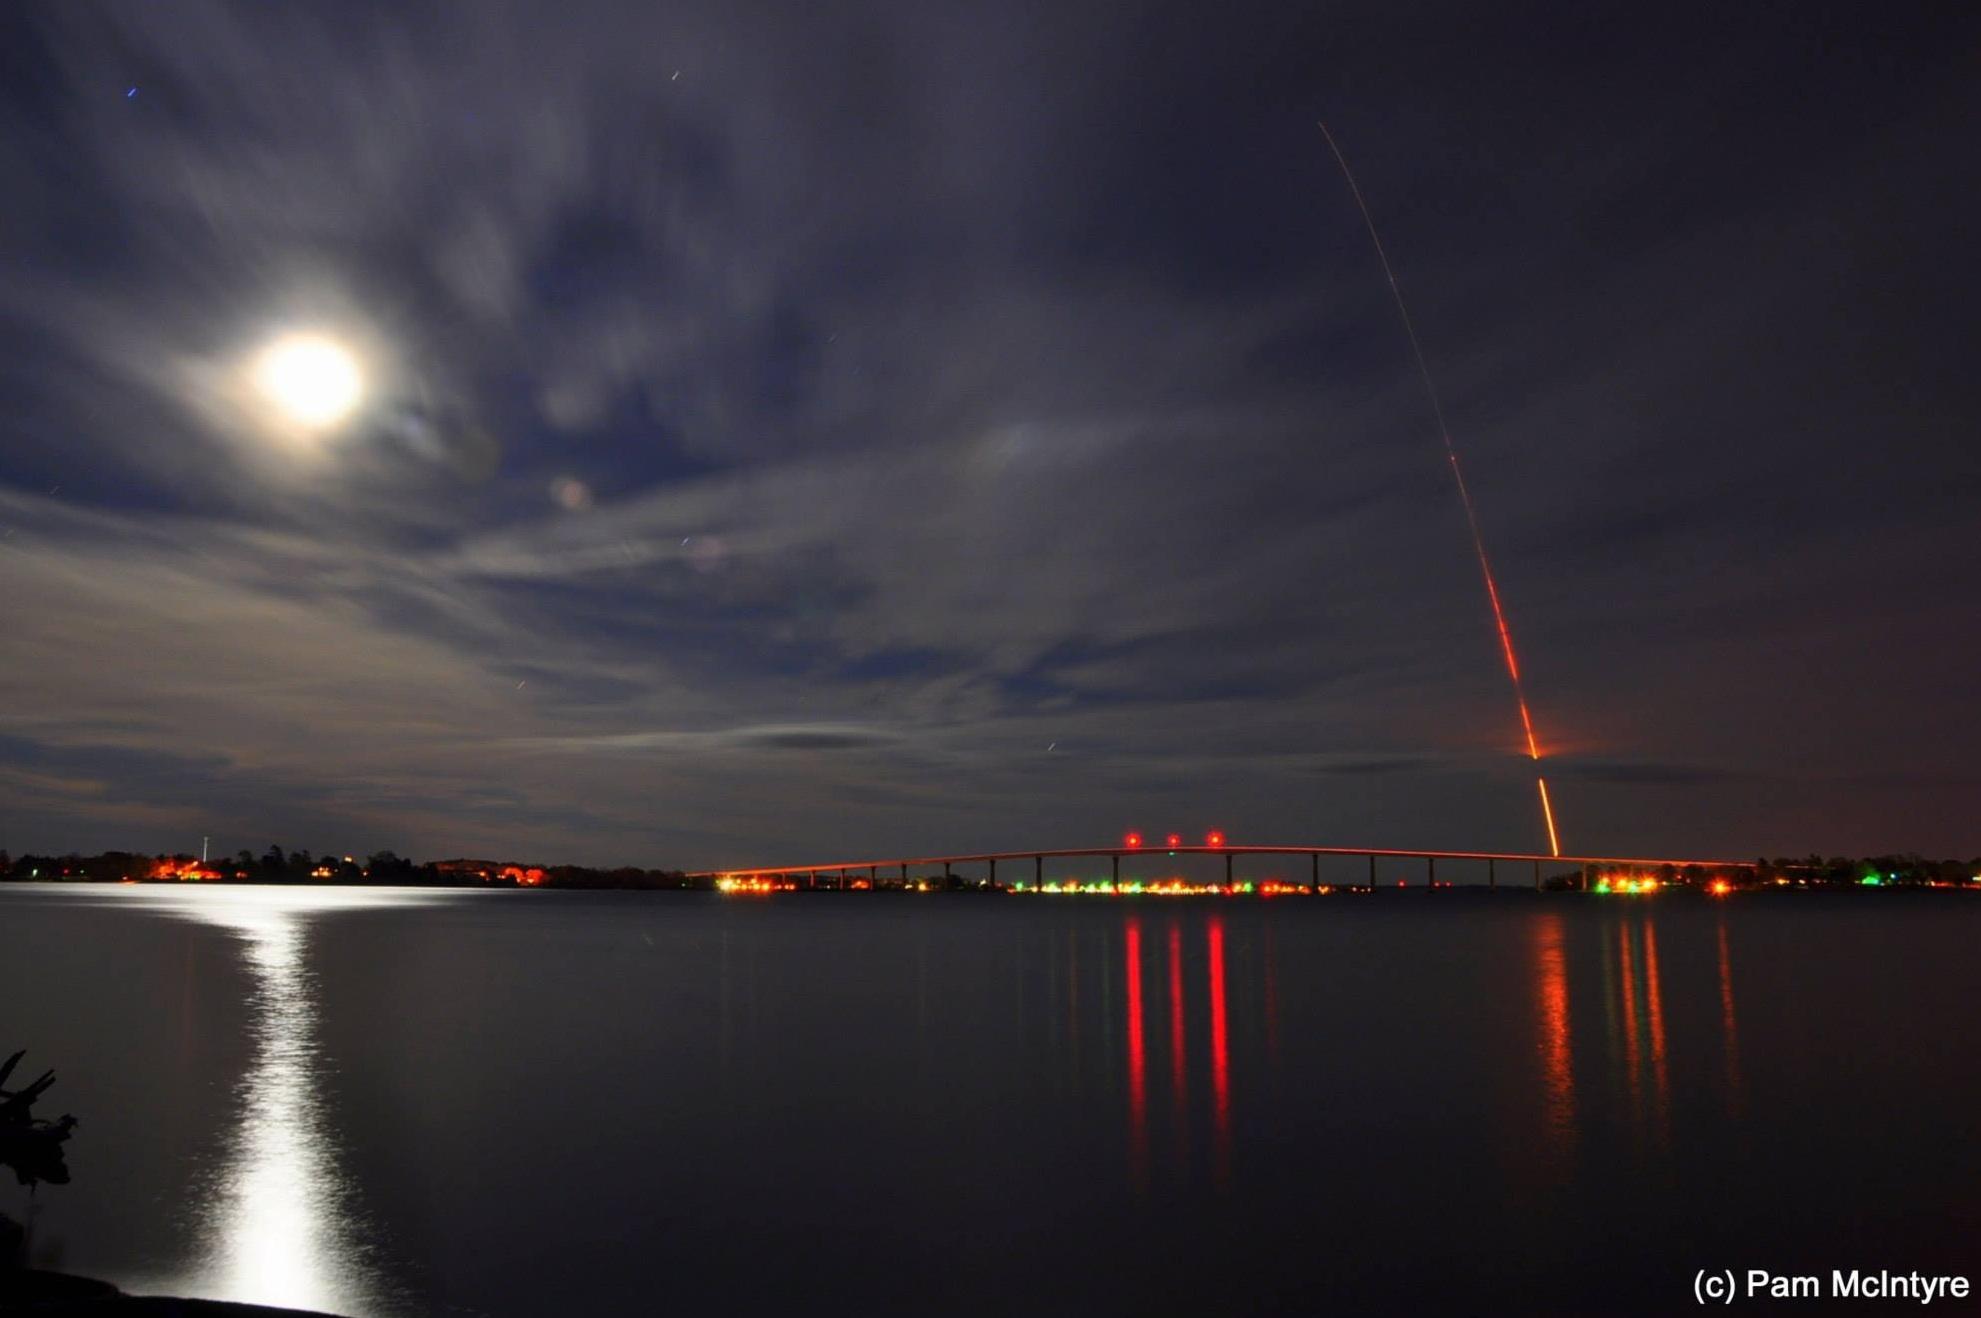 Minotaur 1 Rocket Launch: Pamela McIntyre